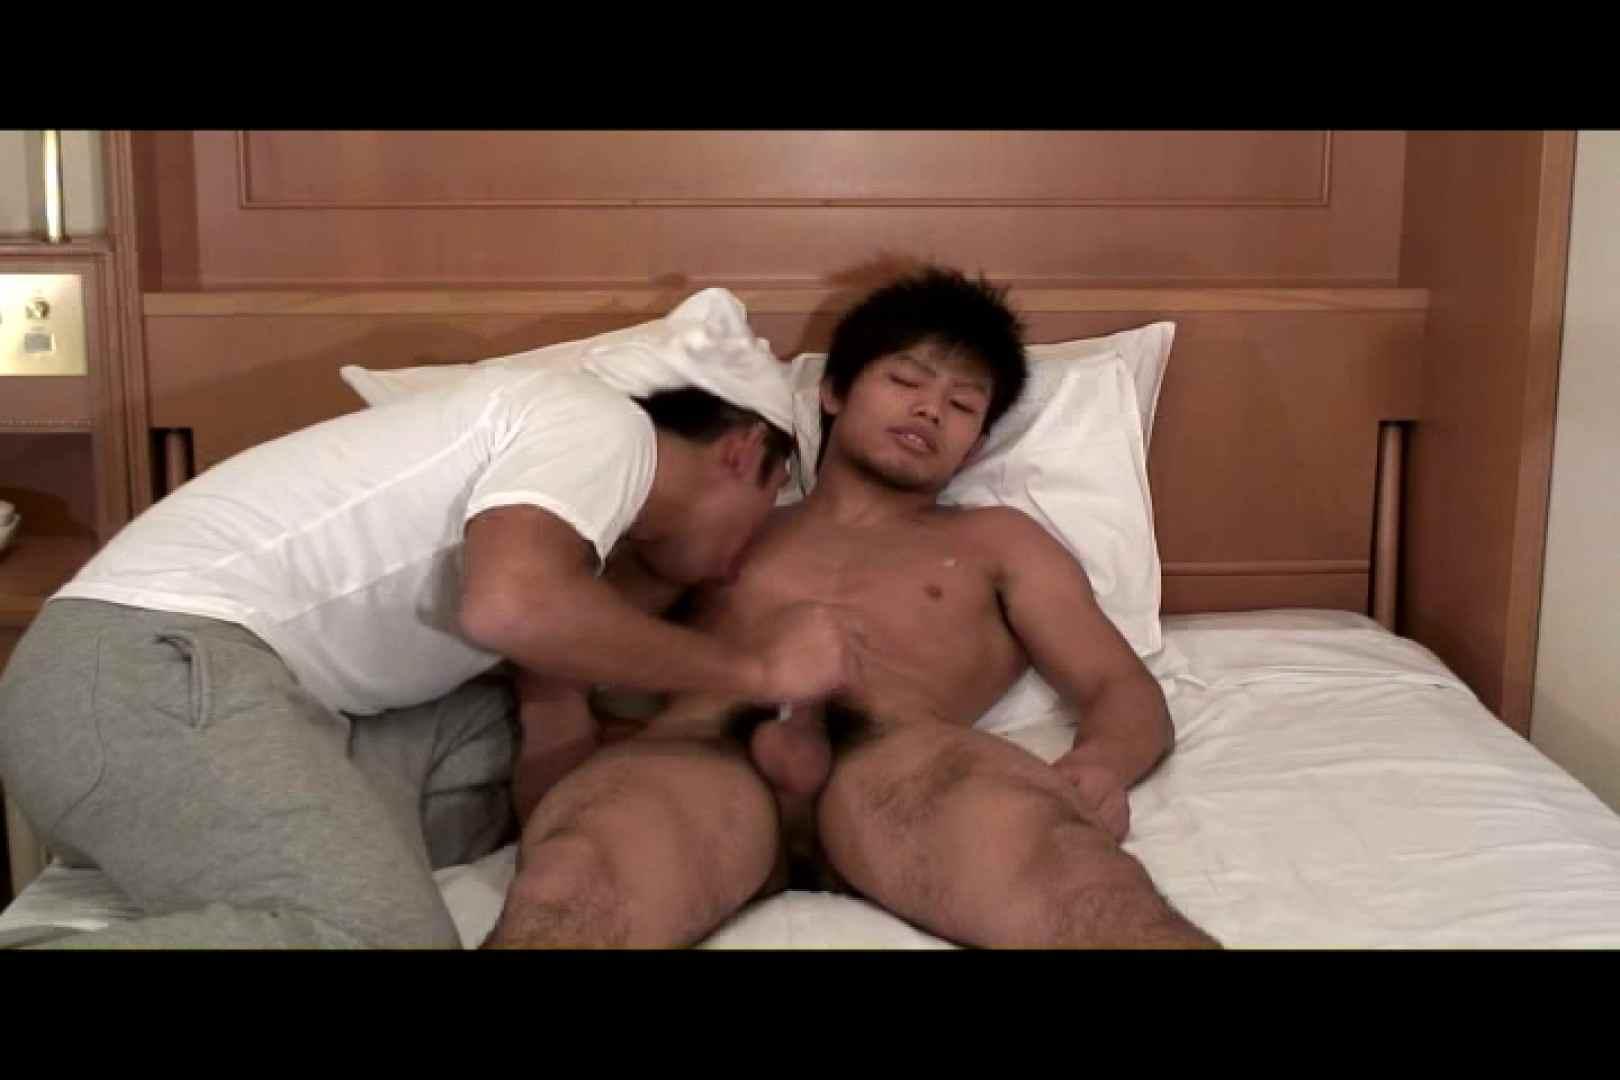 Bistro「イケメン」~Mokkori和風仕立て~vol.02 フェラ天国 ゲイ射精画像 102枚 17